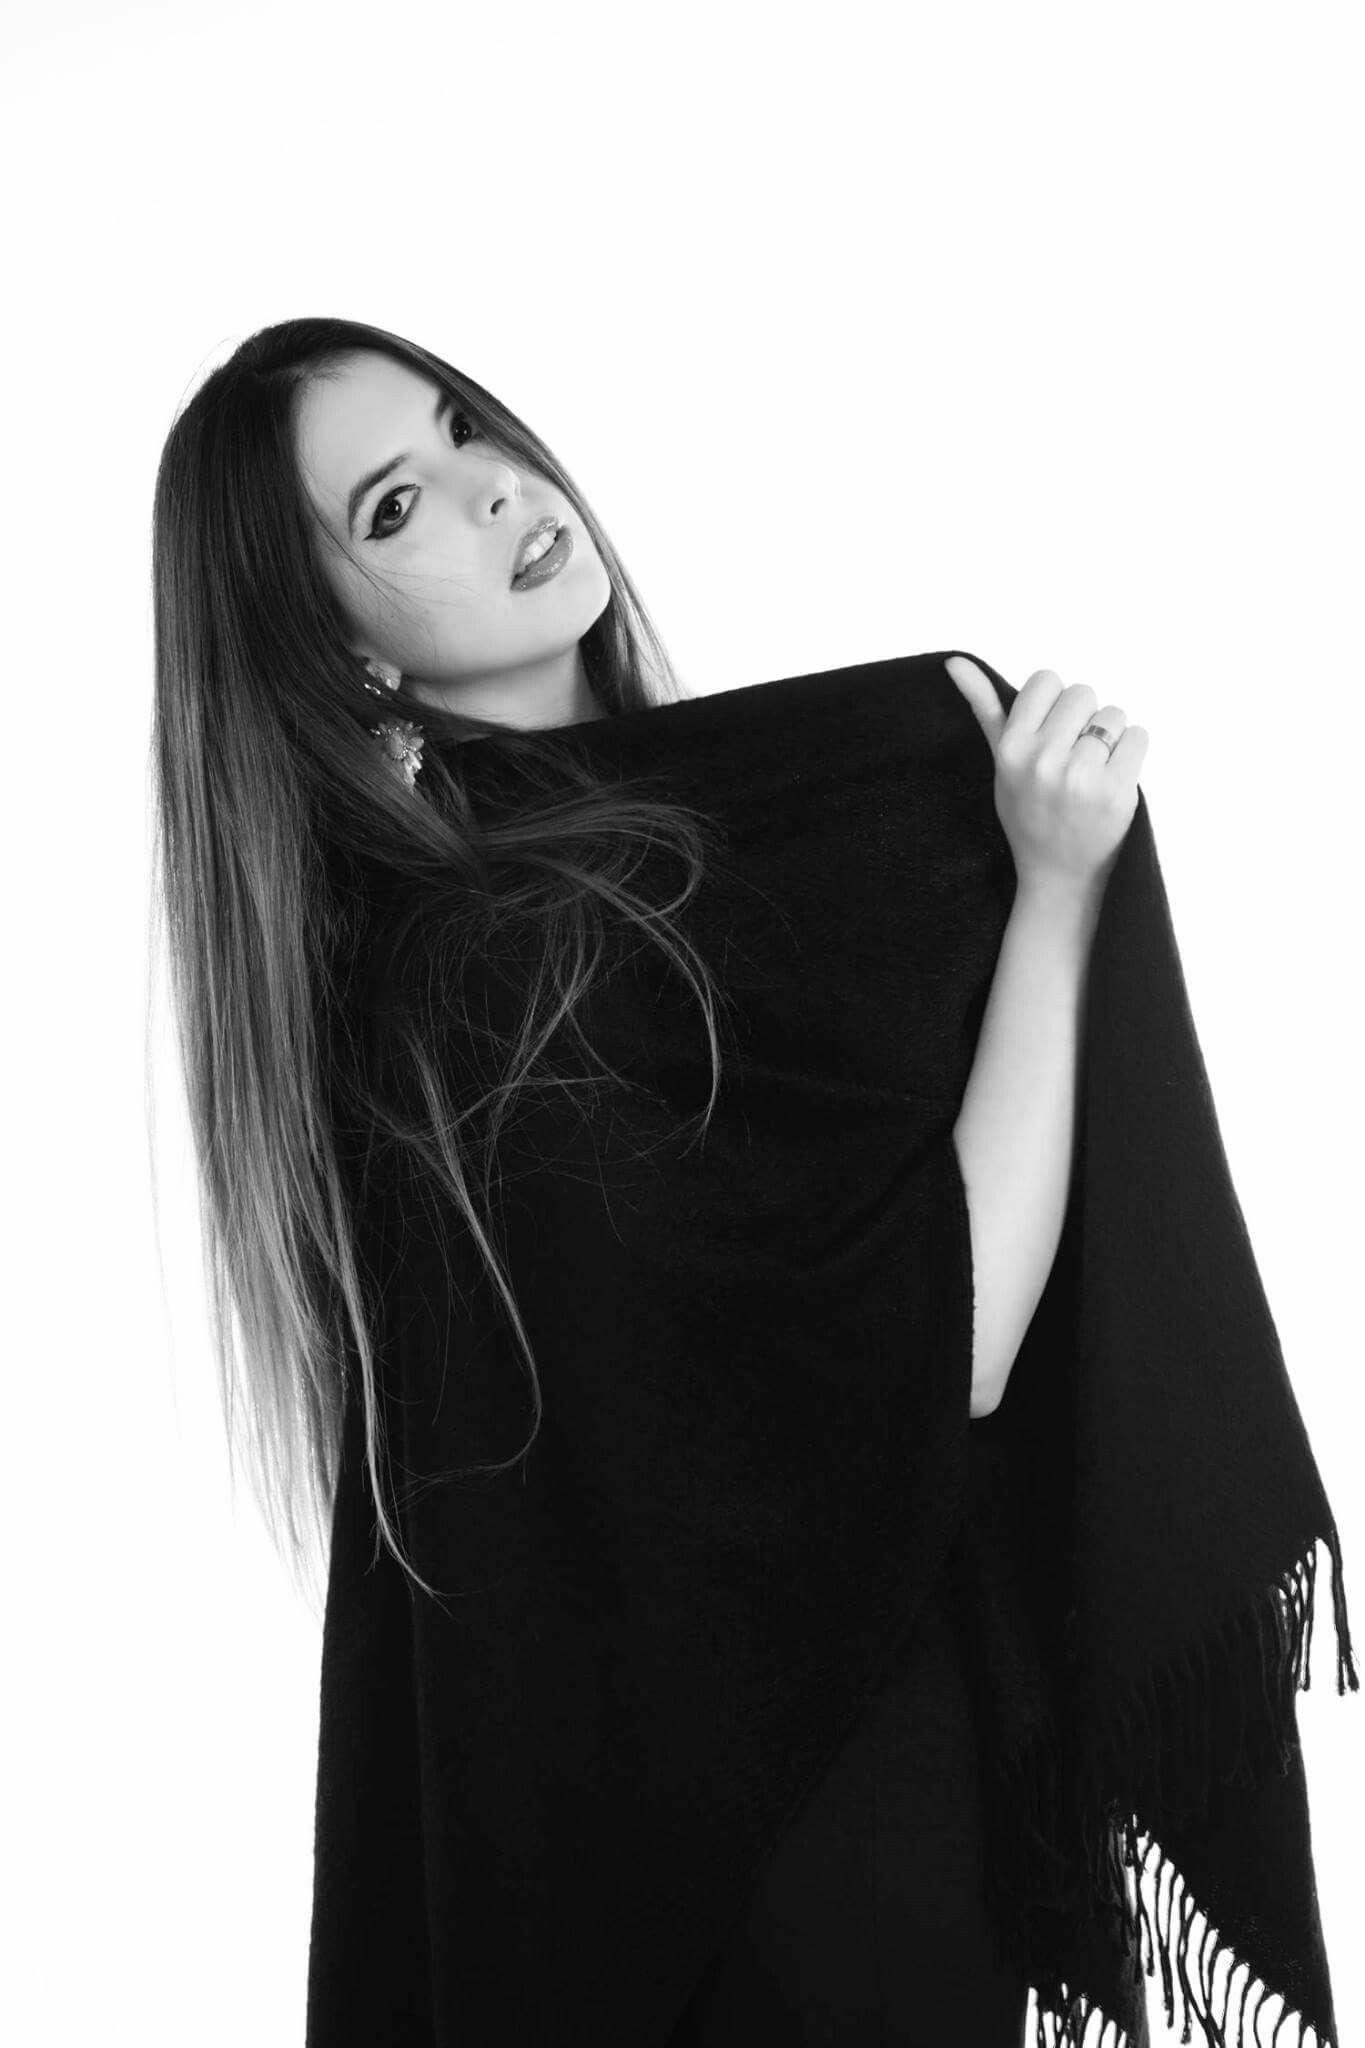 Fotografía: Macarena Basilotta  Modelo: Rocío  Maquillaje y peinado: Moluka